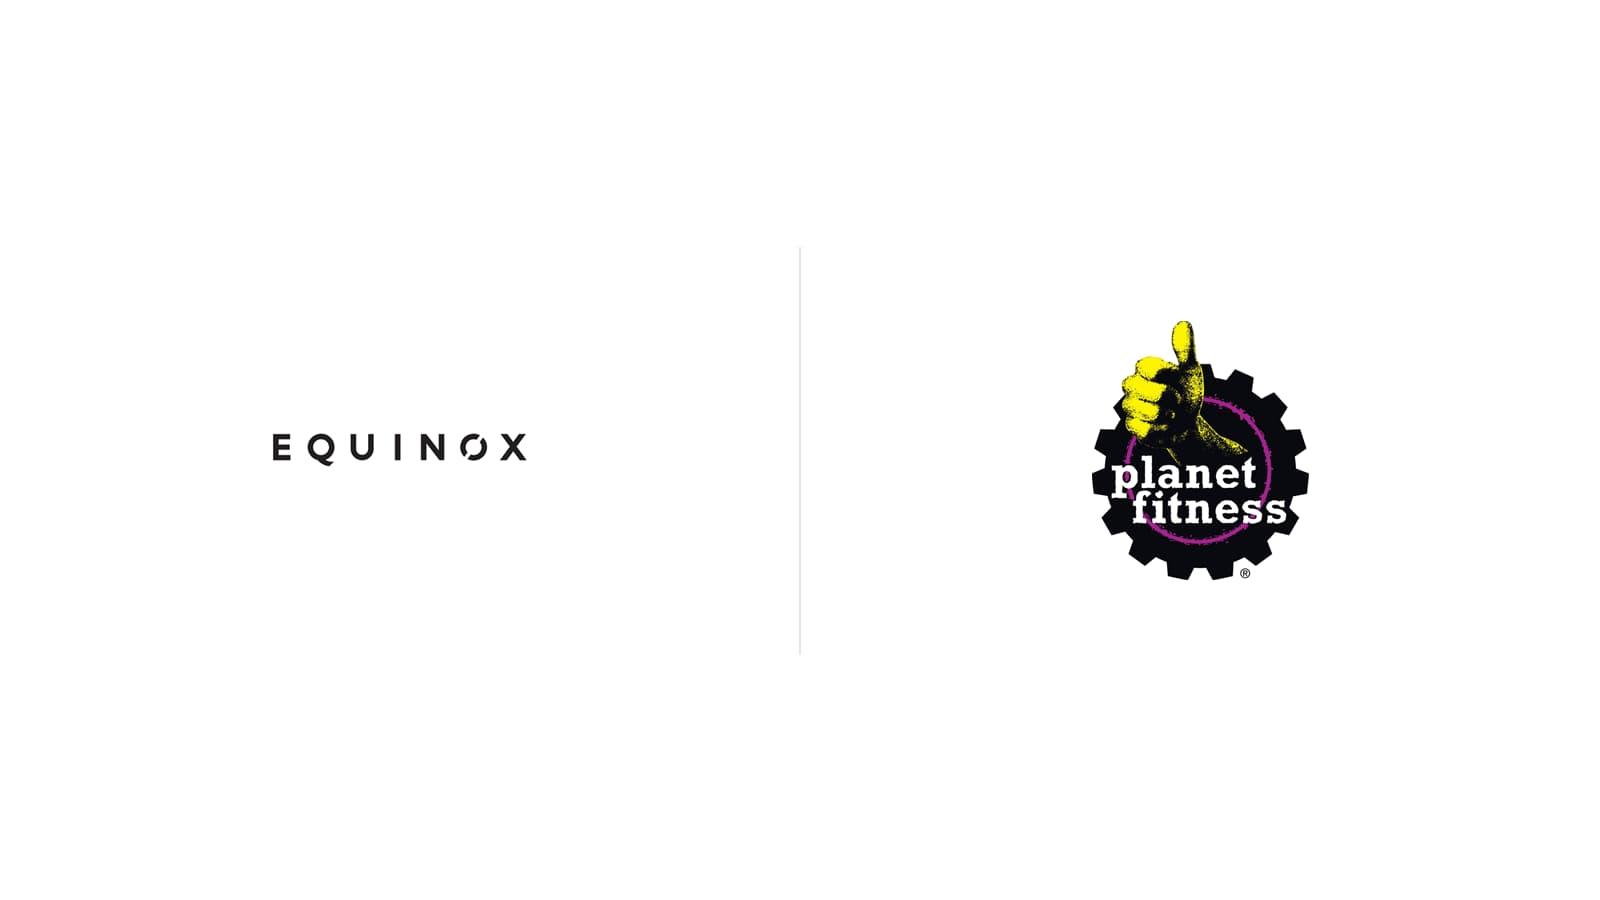 Equinox logo juxtaposed to Planet Fitness logo